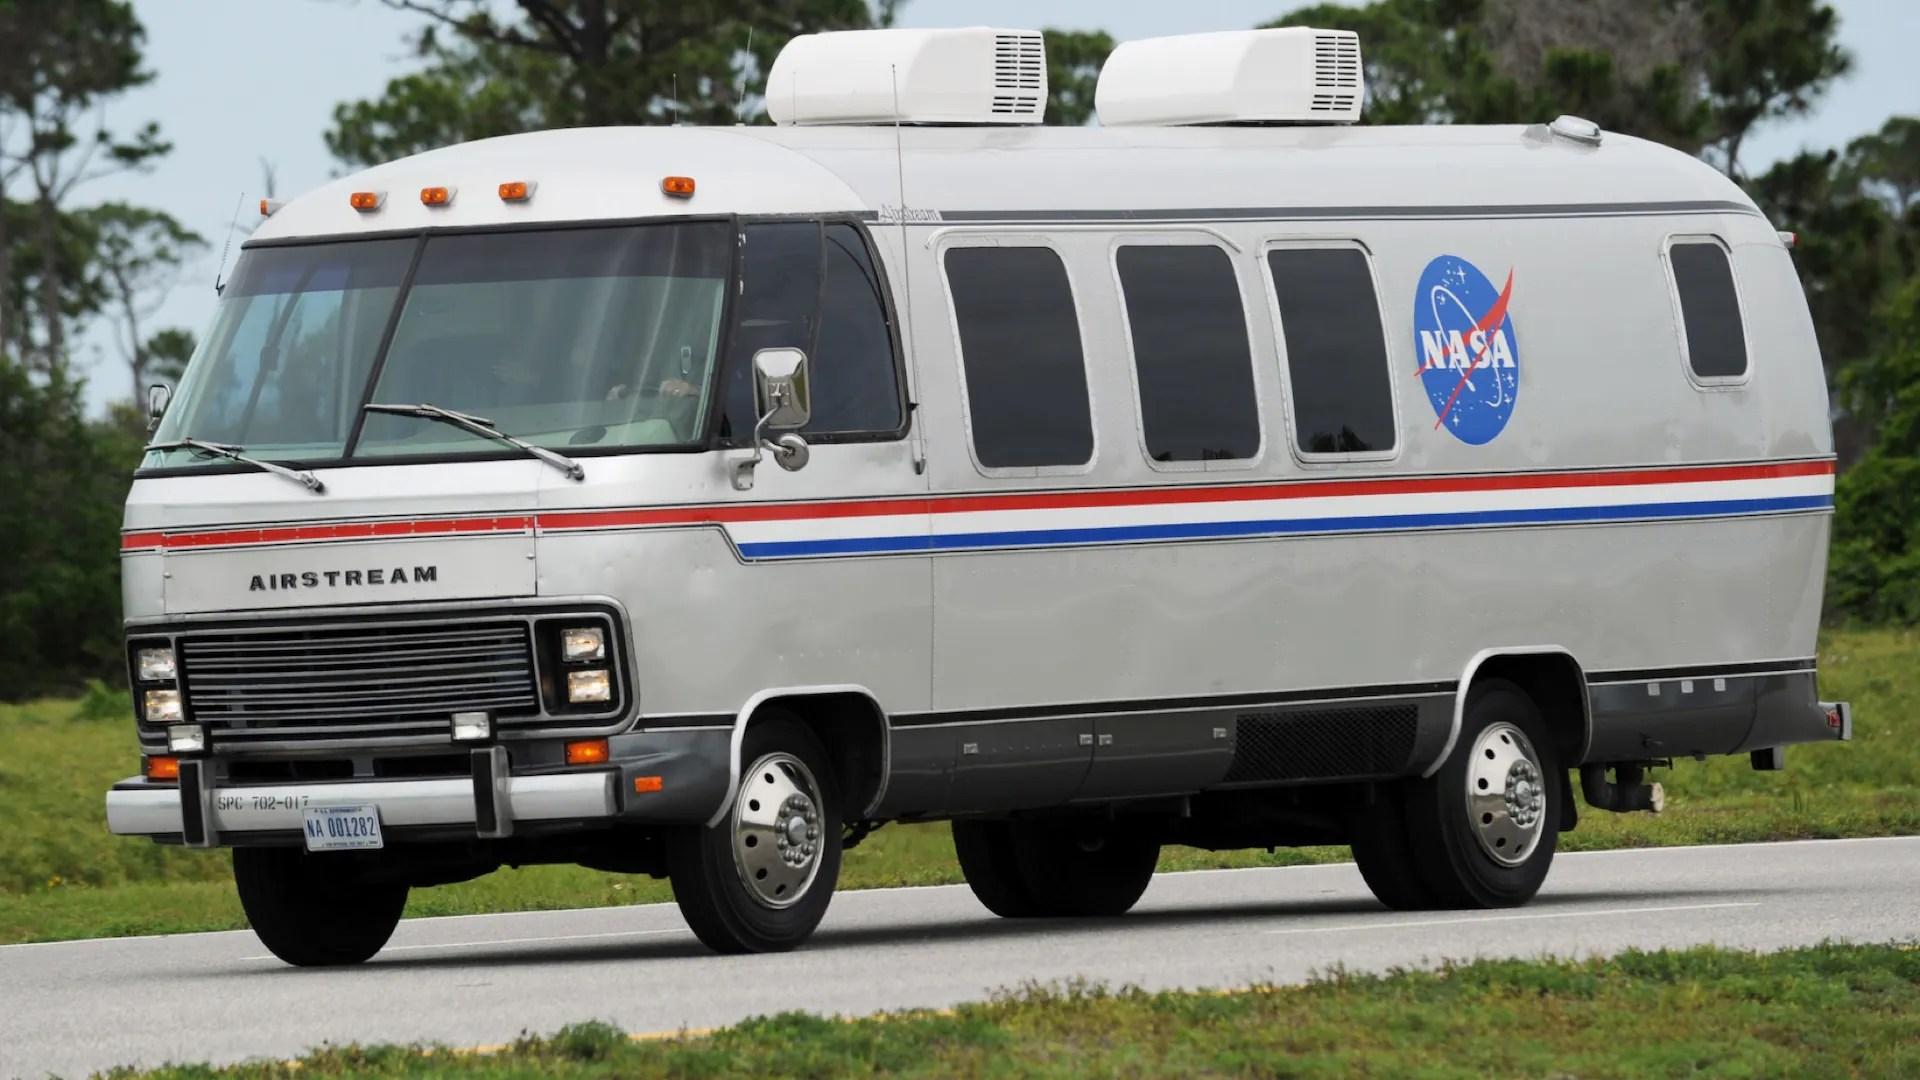 NASA Astronaut Astrovan Motorhome Transport 10